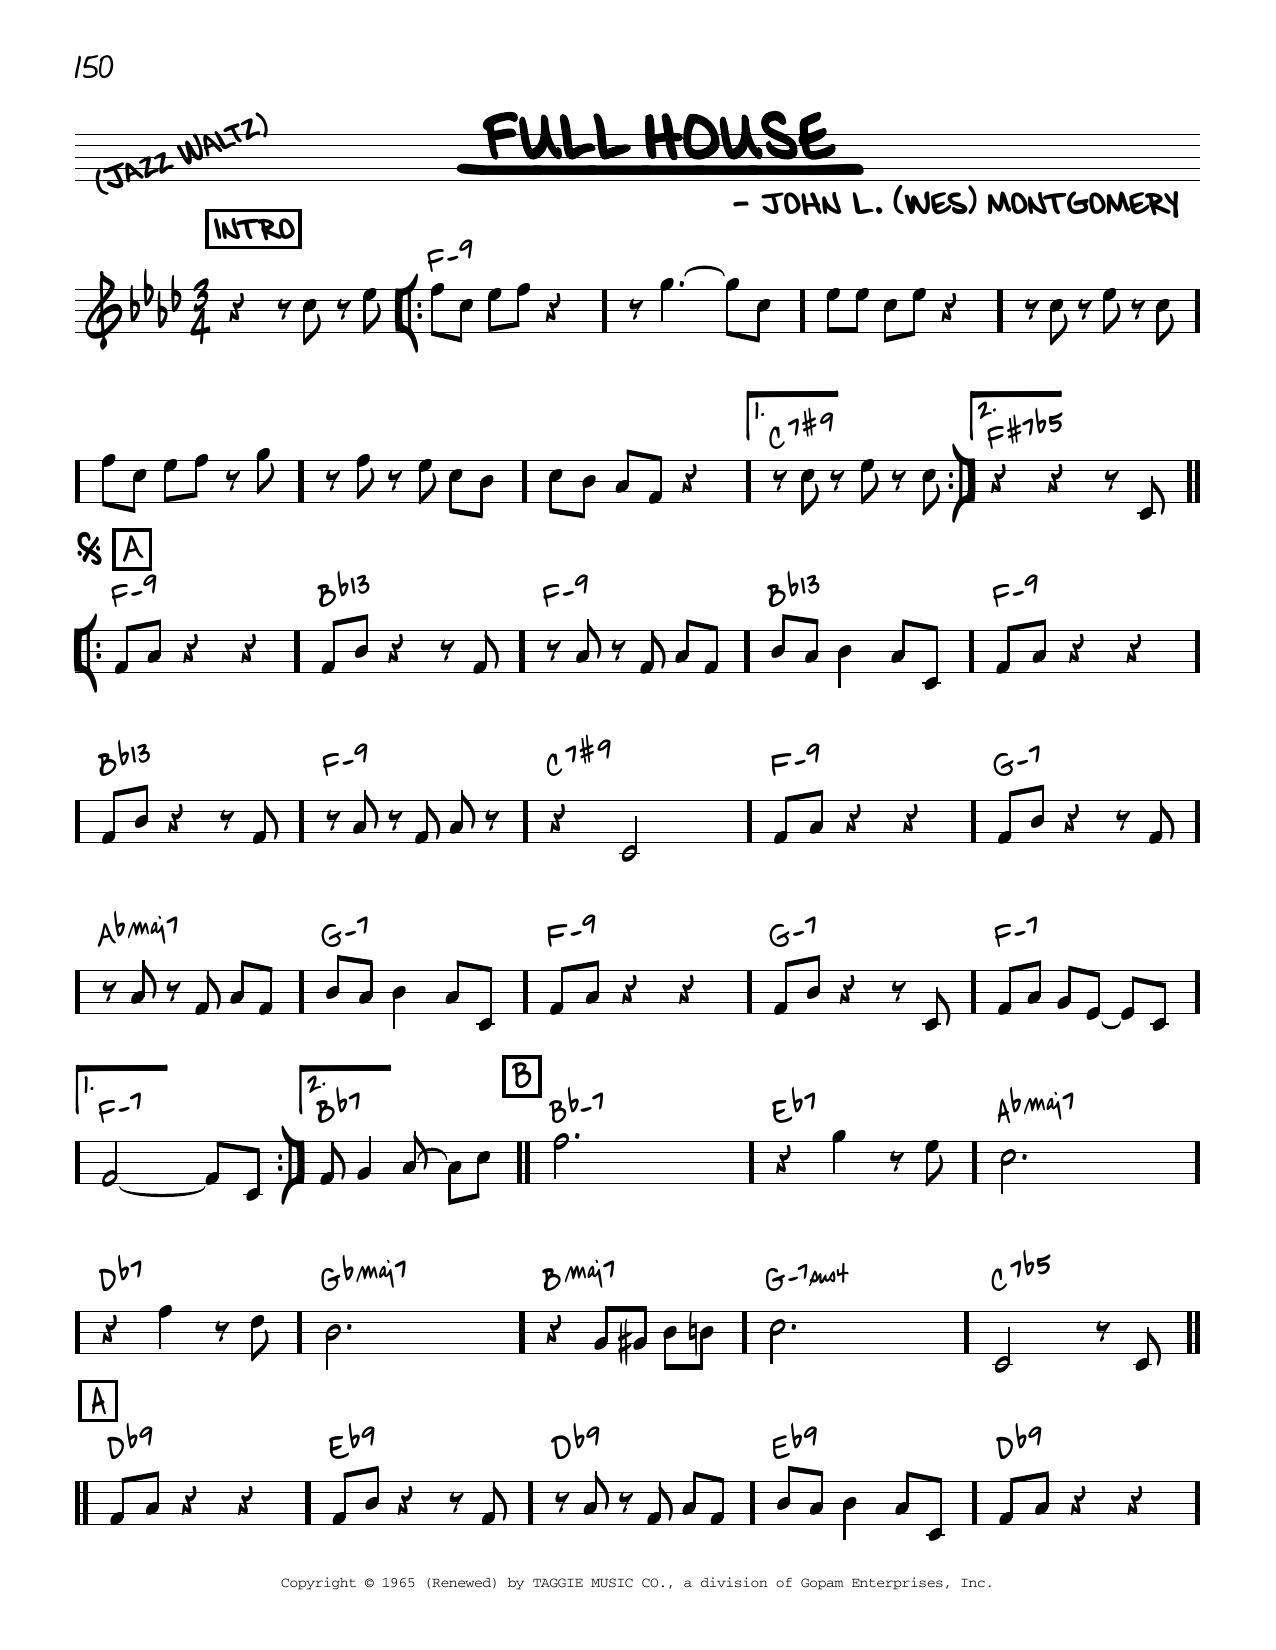 Wes Montgomery Full House [Reharmonized version] (arr. Jack Grassel) sheet music notes printable PDF score